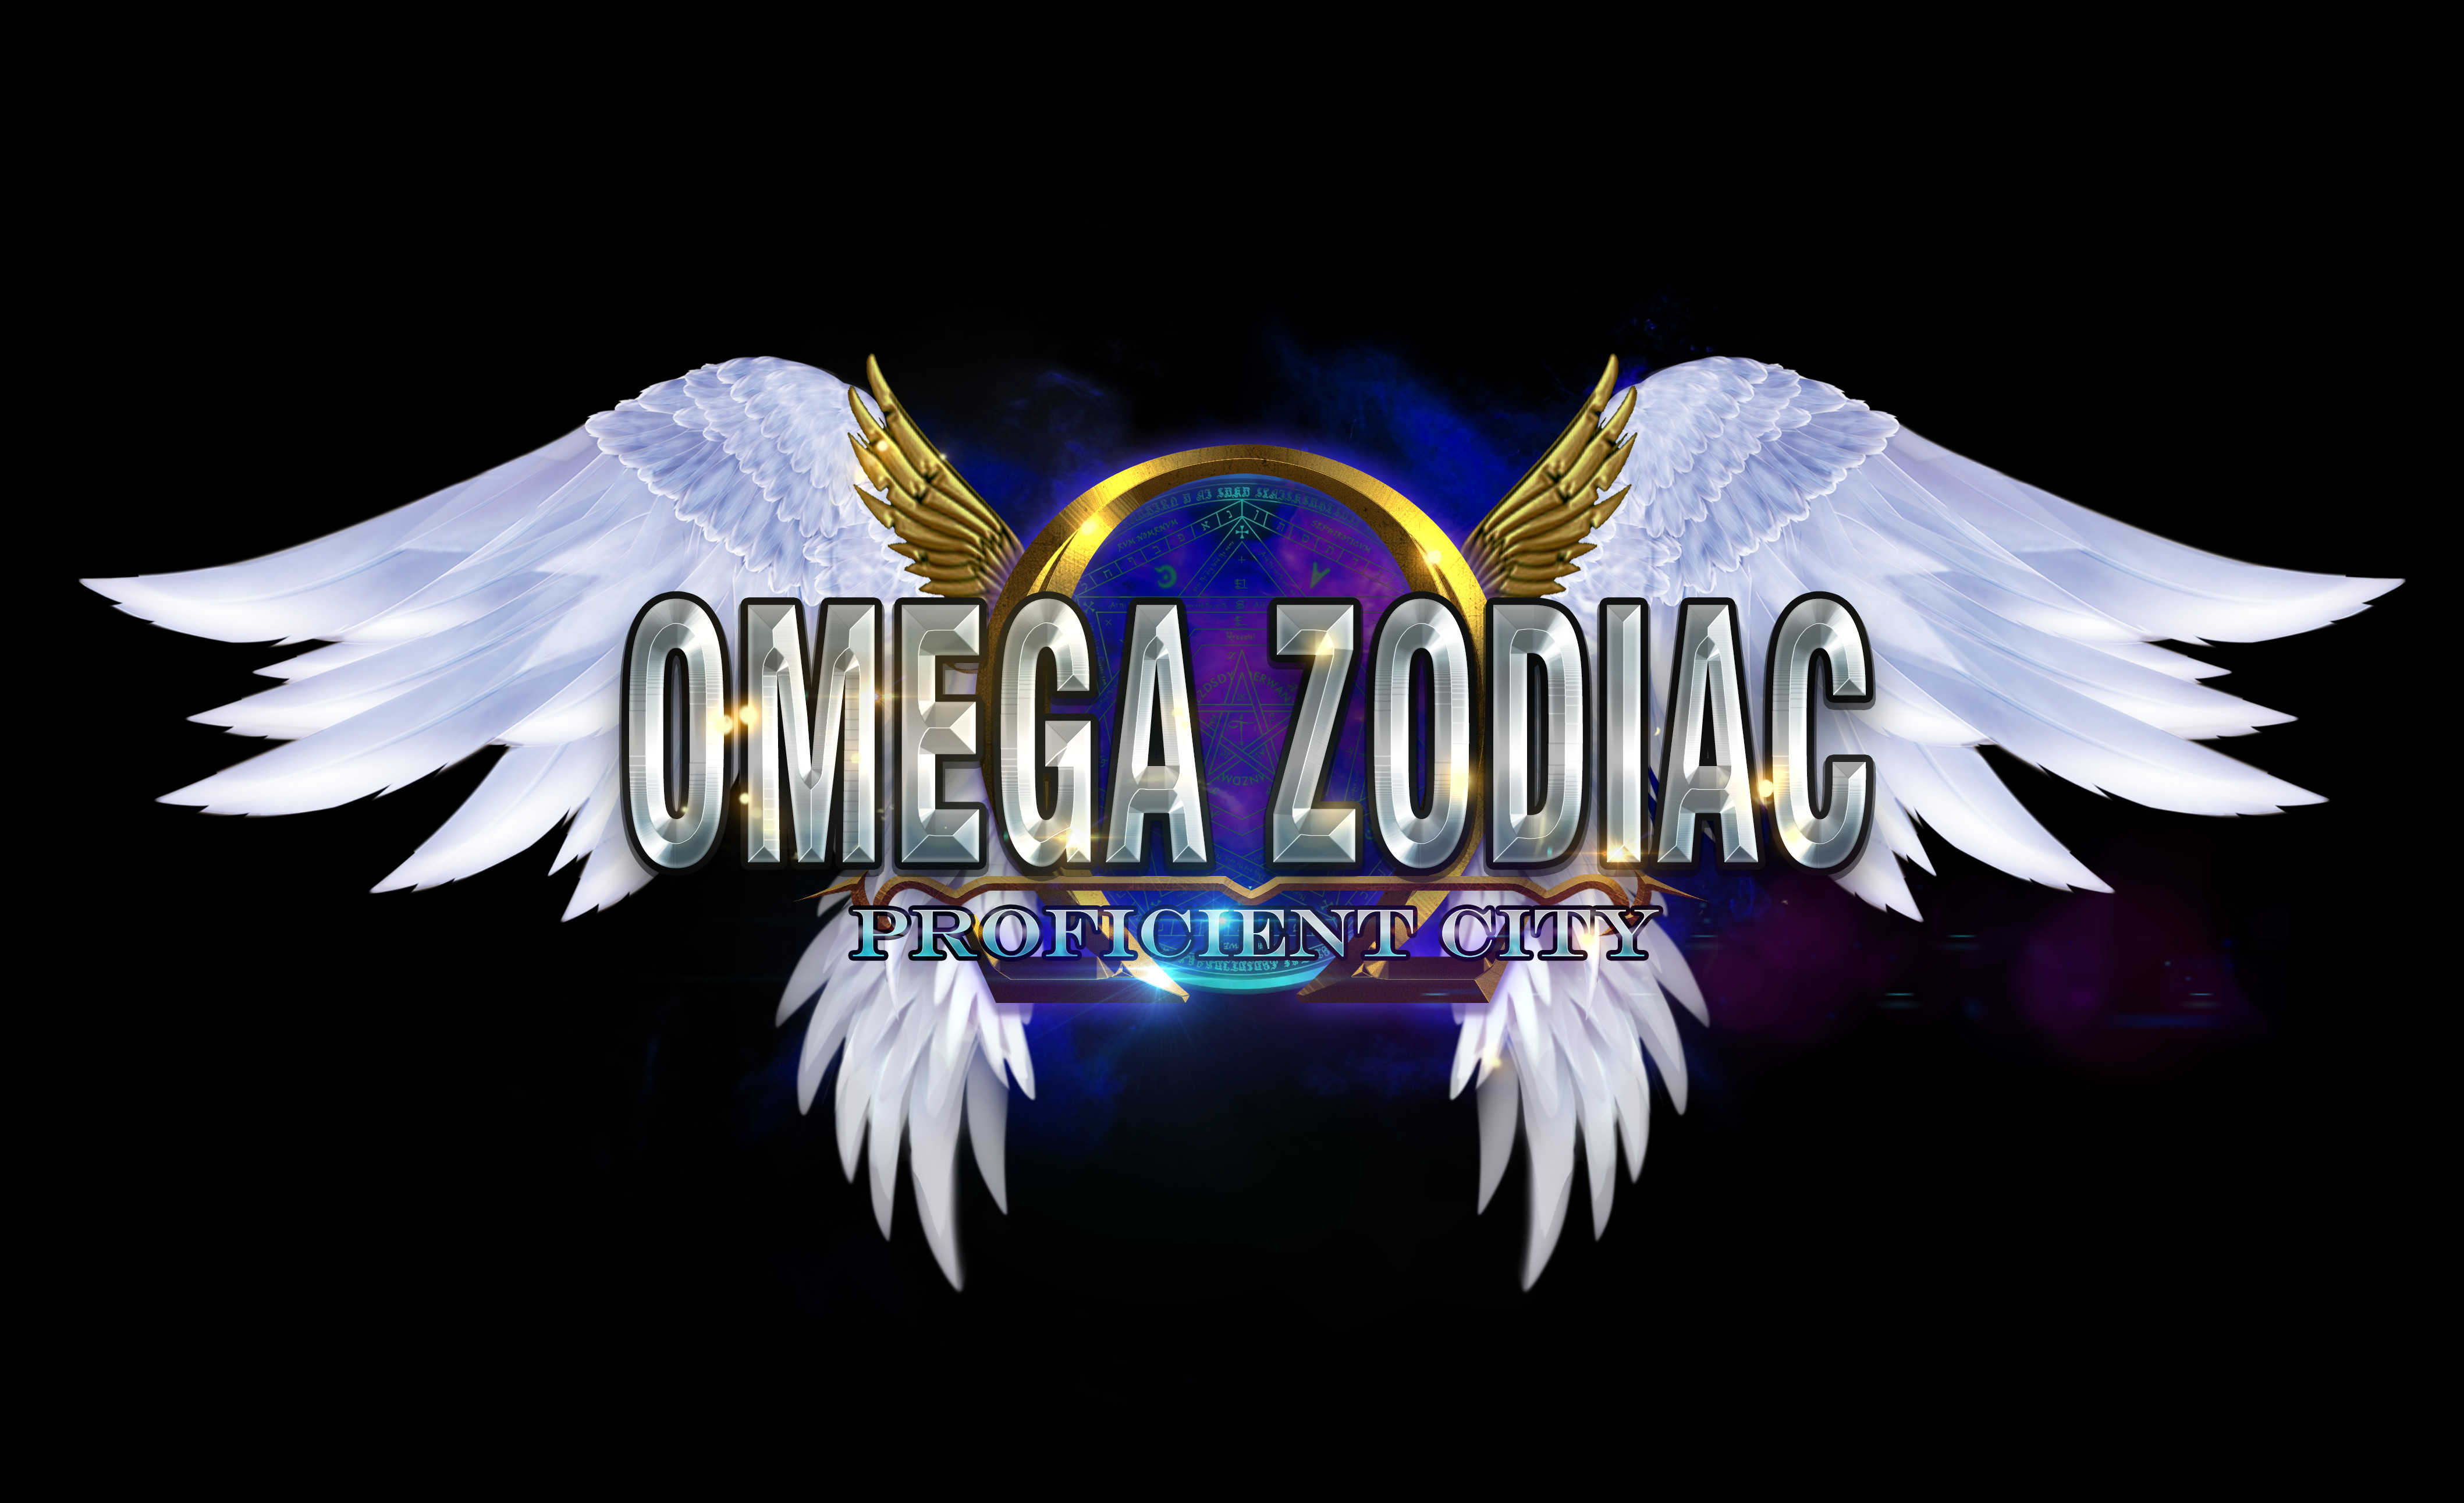 Omega Zodiac: Defending Athena